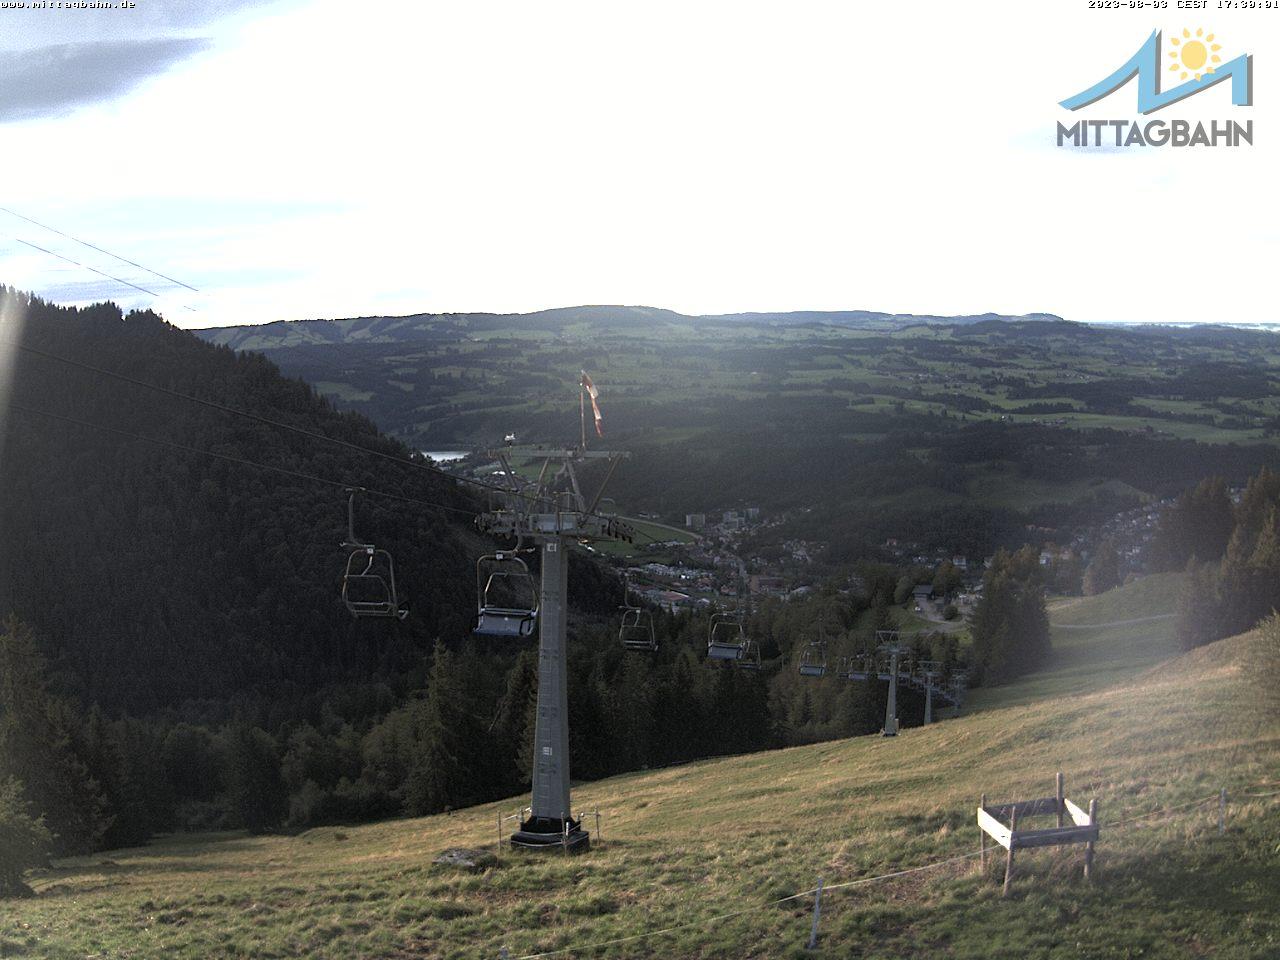 Webcam Skigebied Immenstadt - Mittag cam 8 - Allgäuer Alpen